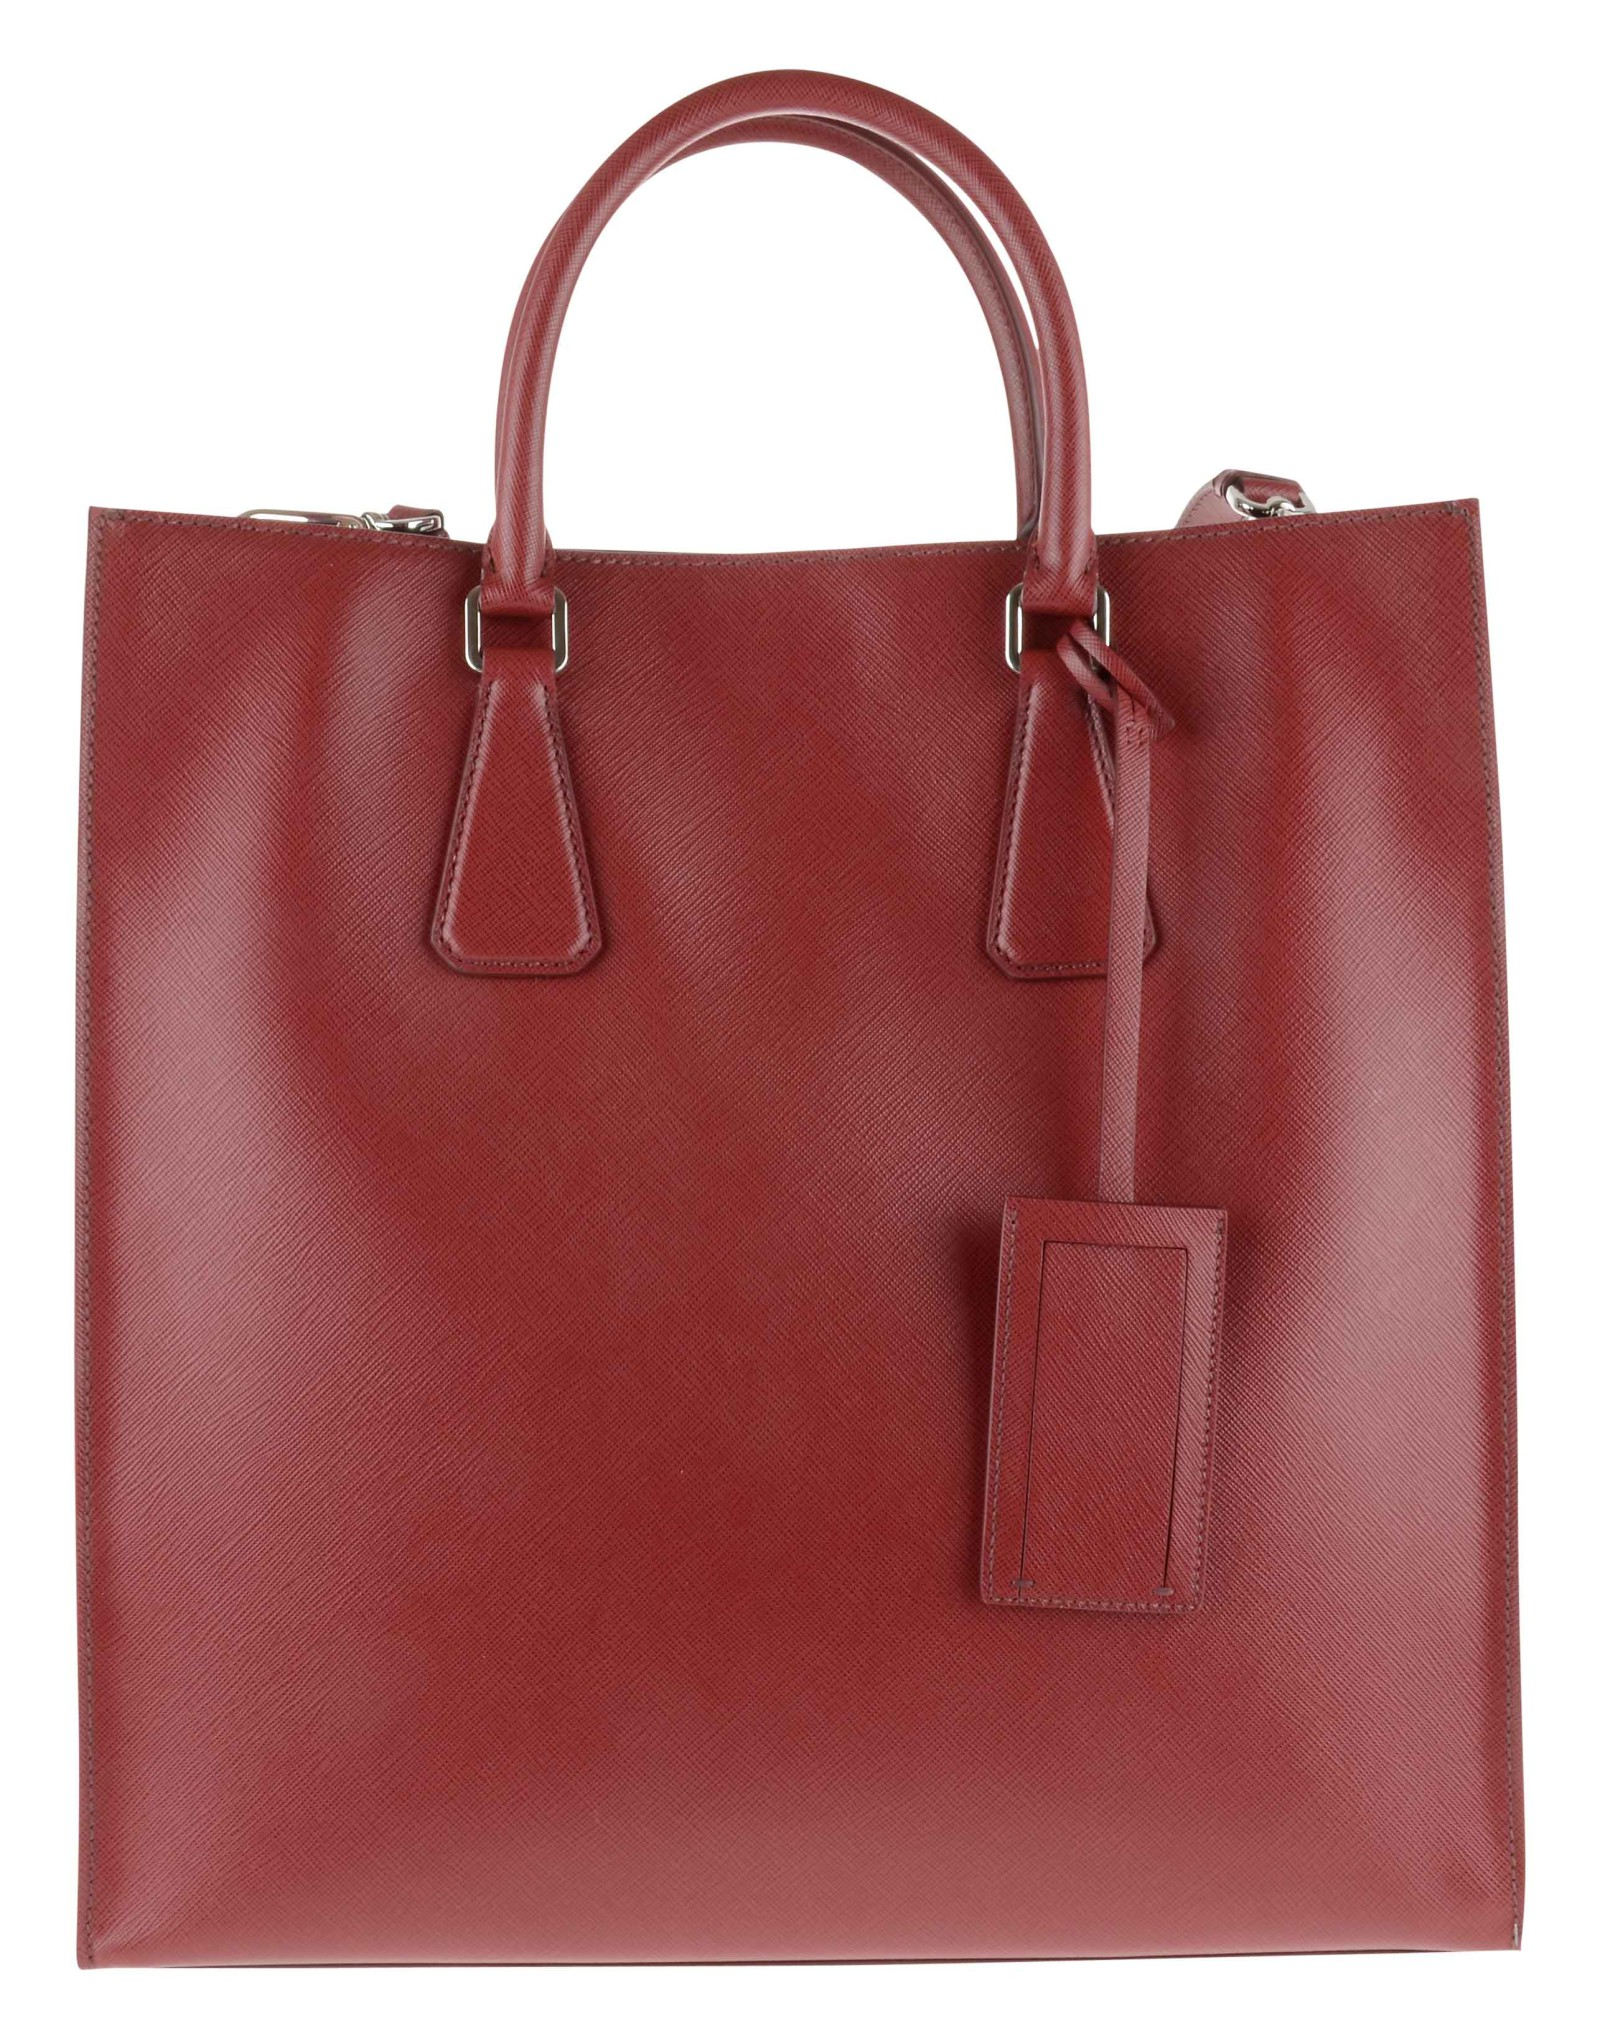 prada suede handbags - Prada Borsa Viaggio Saffiano Travel Rosso Rubino Info: Chiusura in ...